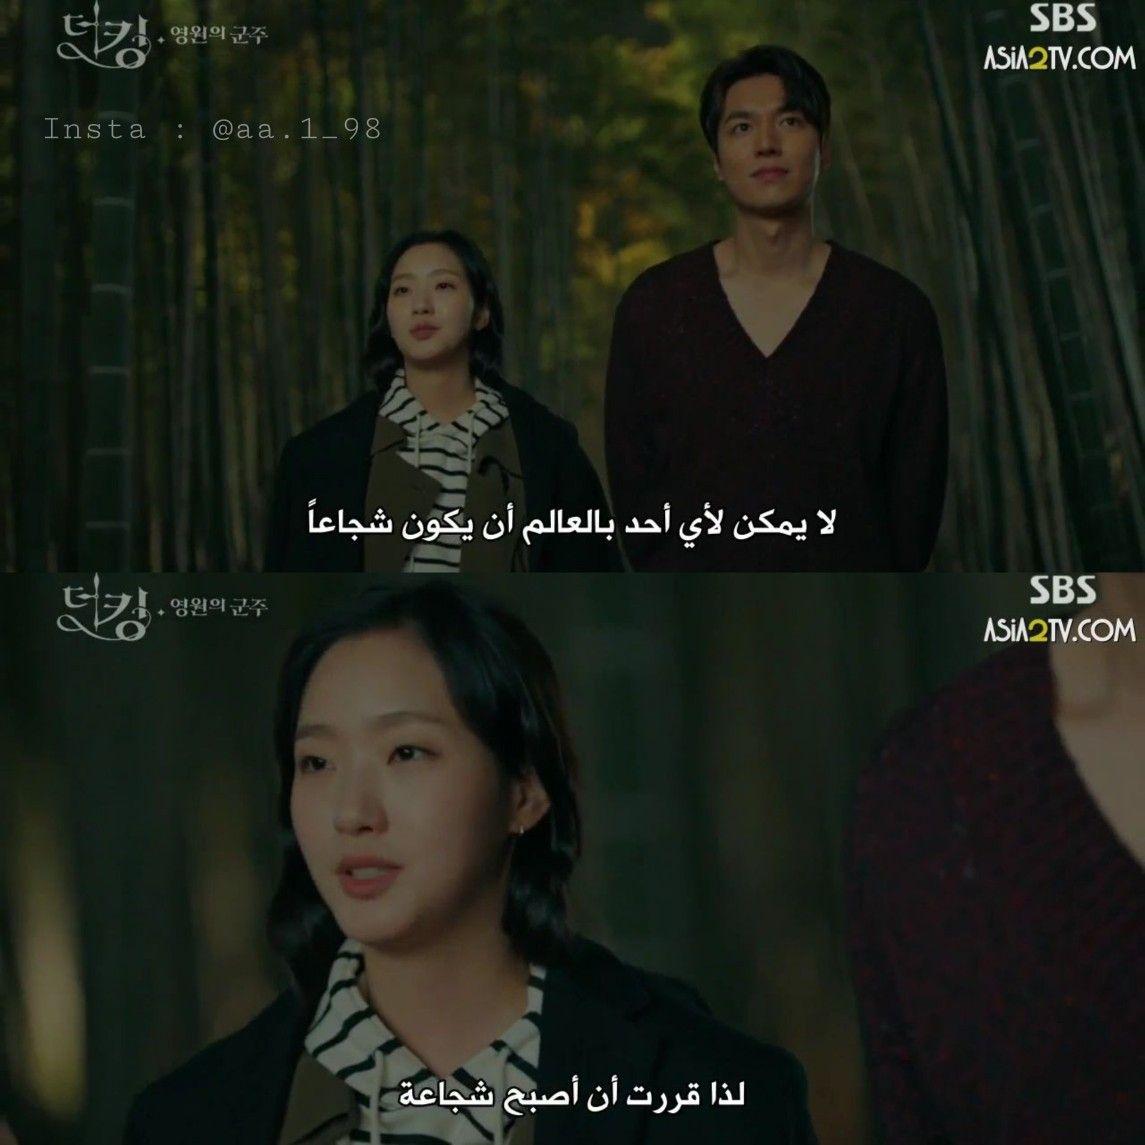 The King Drama In 2020 Quotes Drama Korea Kdrama Quotes Drama